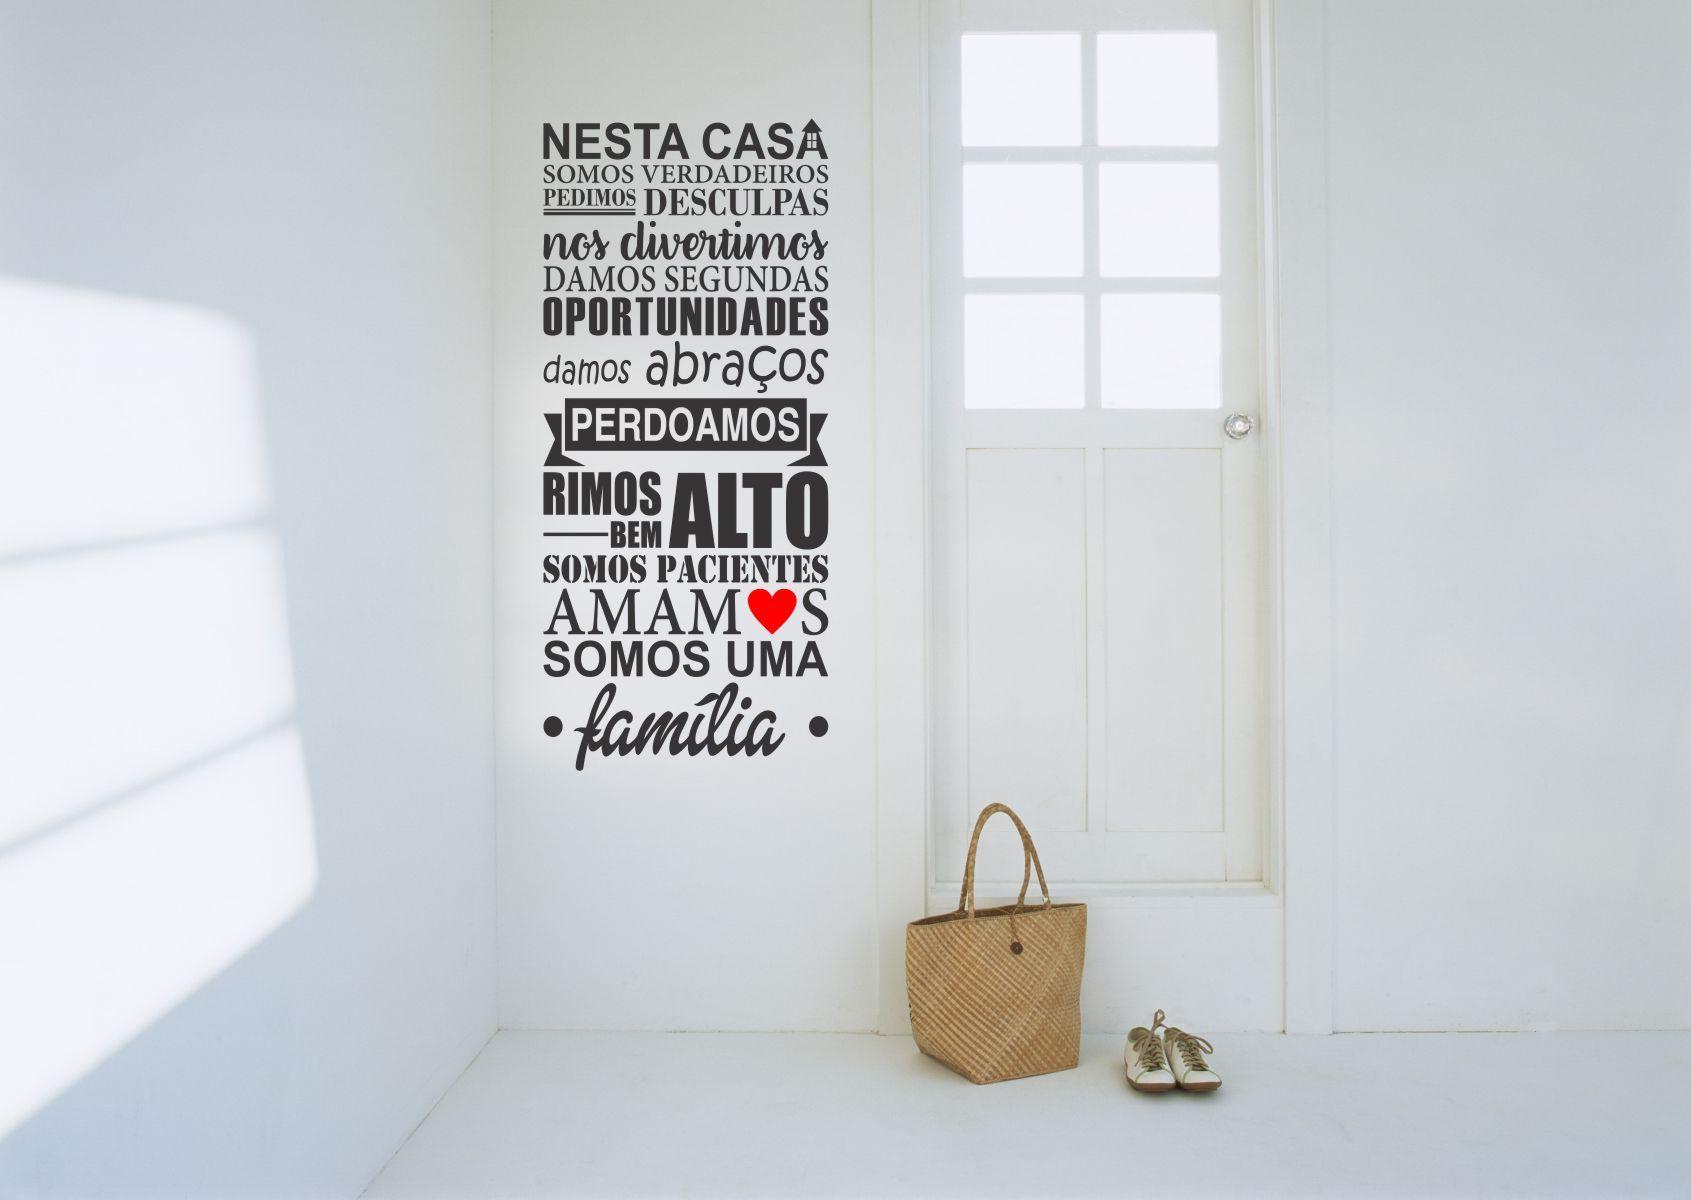 Adesivo Frase Nesta Casa - 110cm - Qualidade Vinilstudio